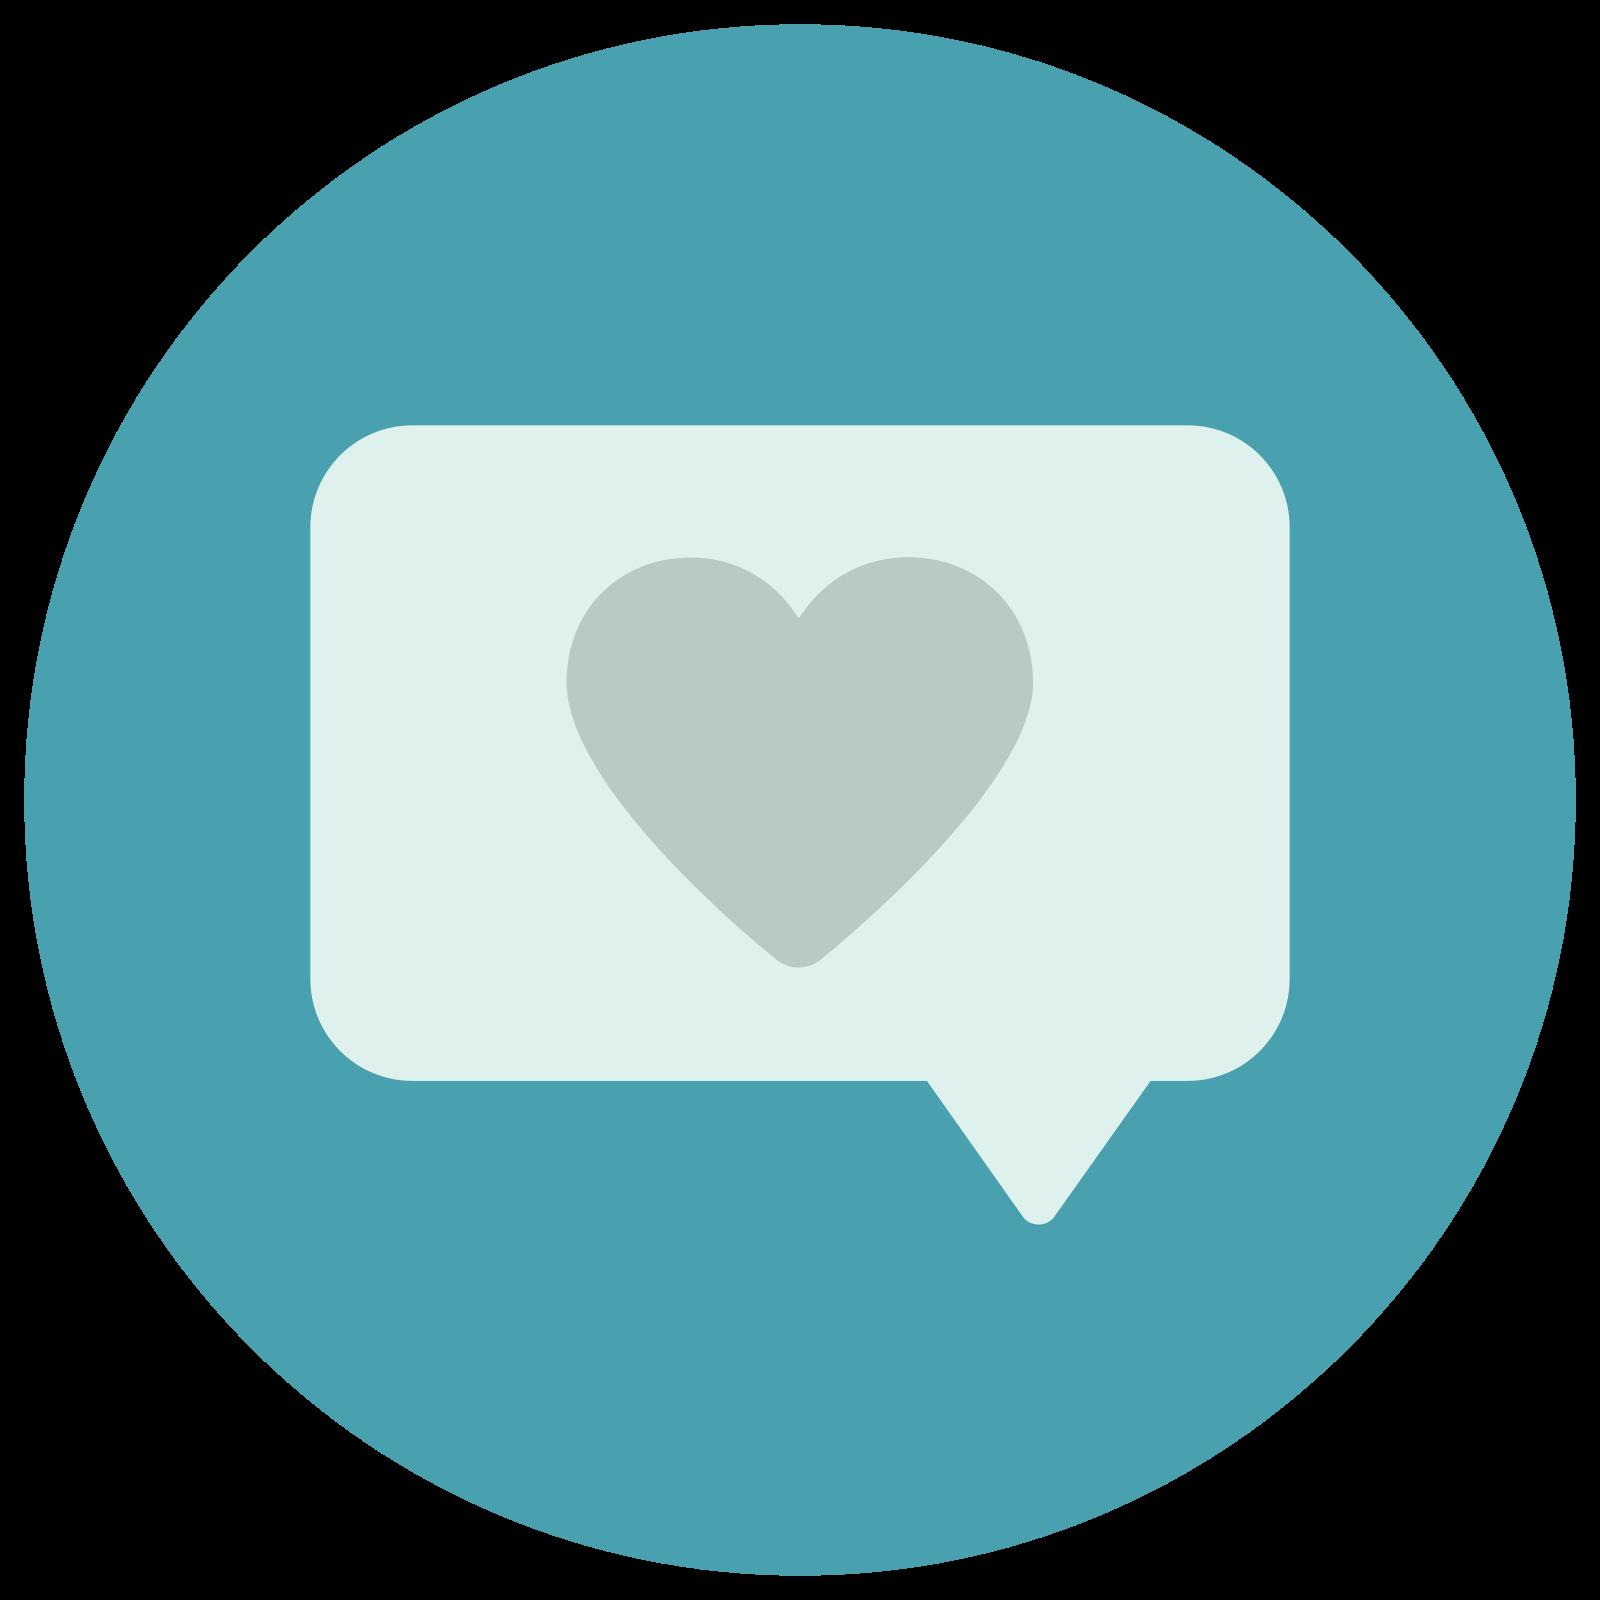 Mensagem de amor icon